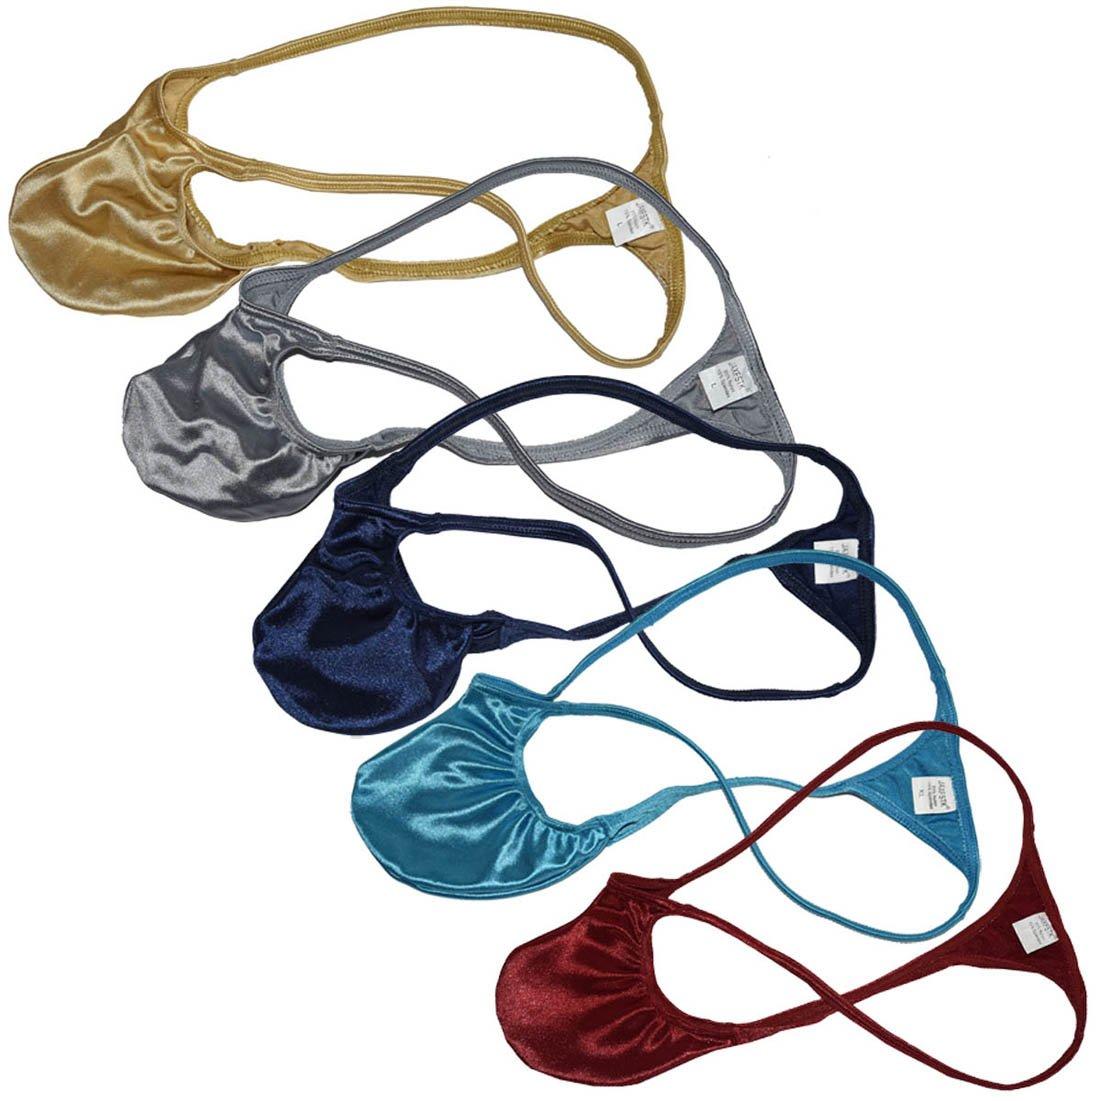 1e964ab4fd26 JAXFSTK Men Athletic Shiny Micro T-Back Guys Thongs Bikini String Underwear  Male Gym Pouch Shiny Tangas Mini Pants Pack of 5 XL